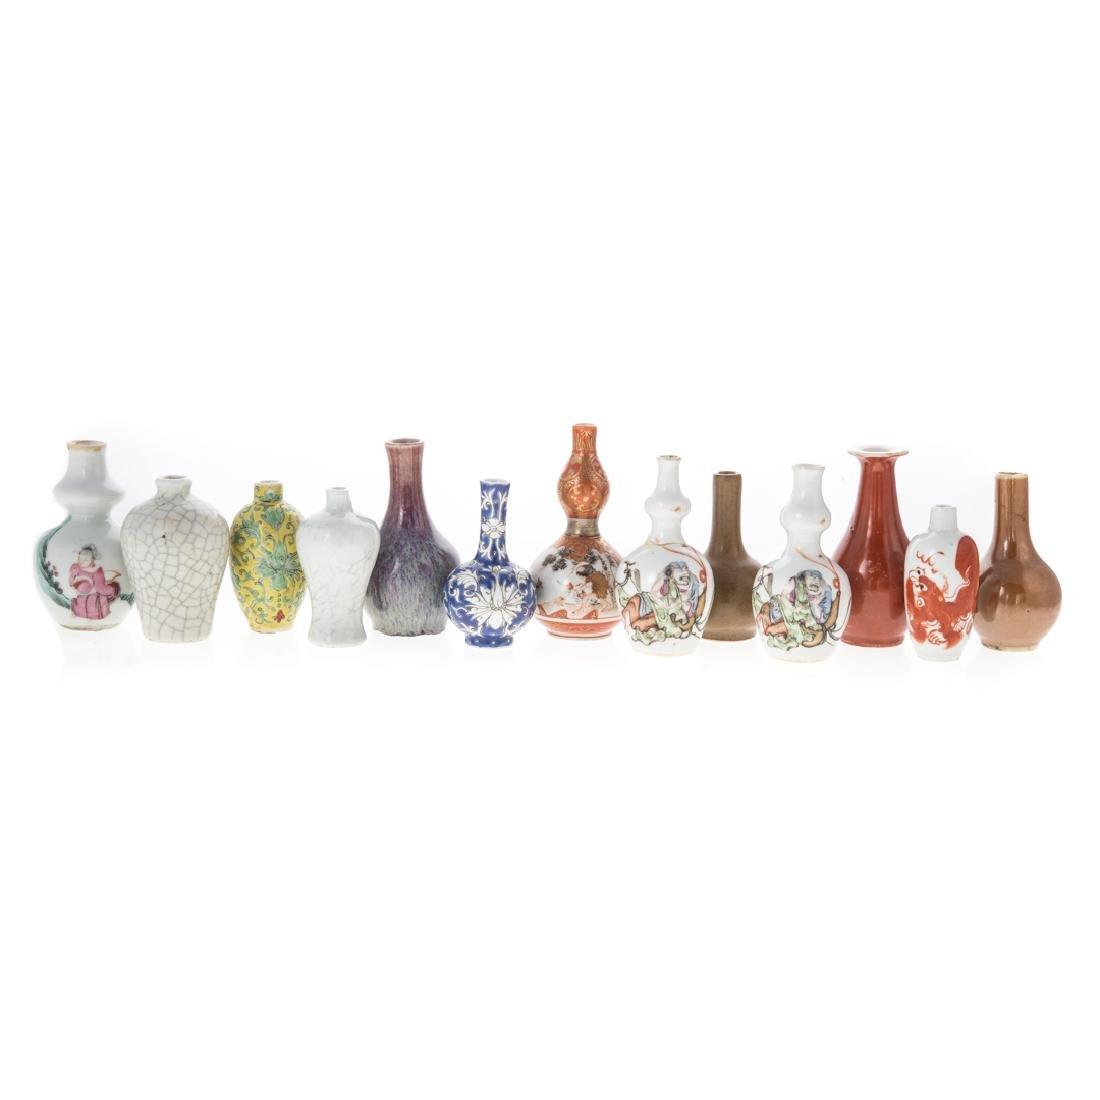 12 Chinese porcelain miniature vases